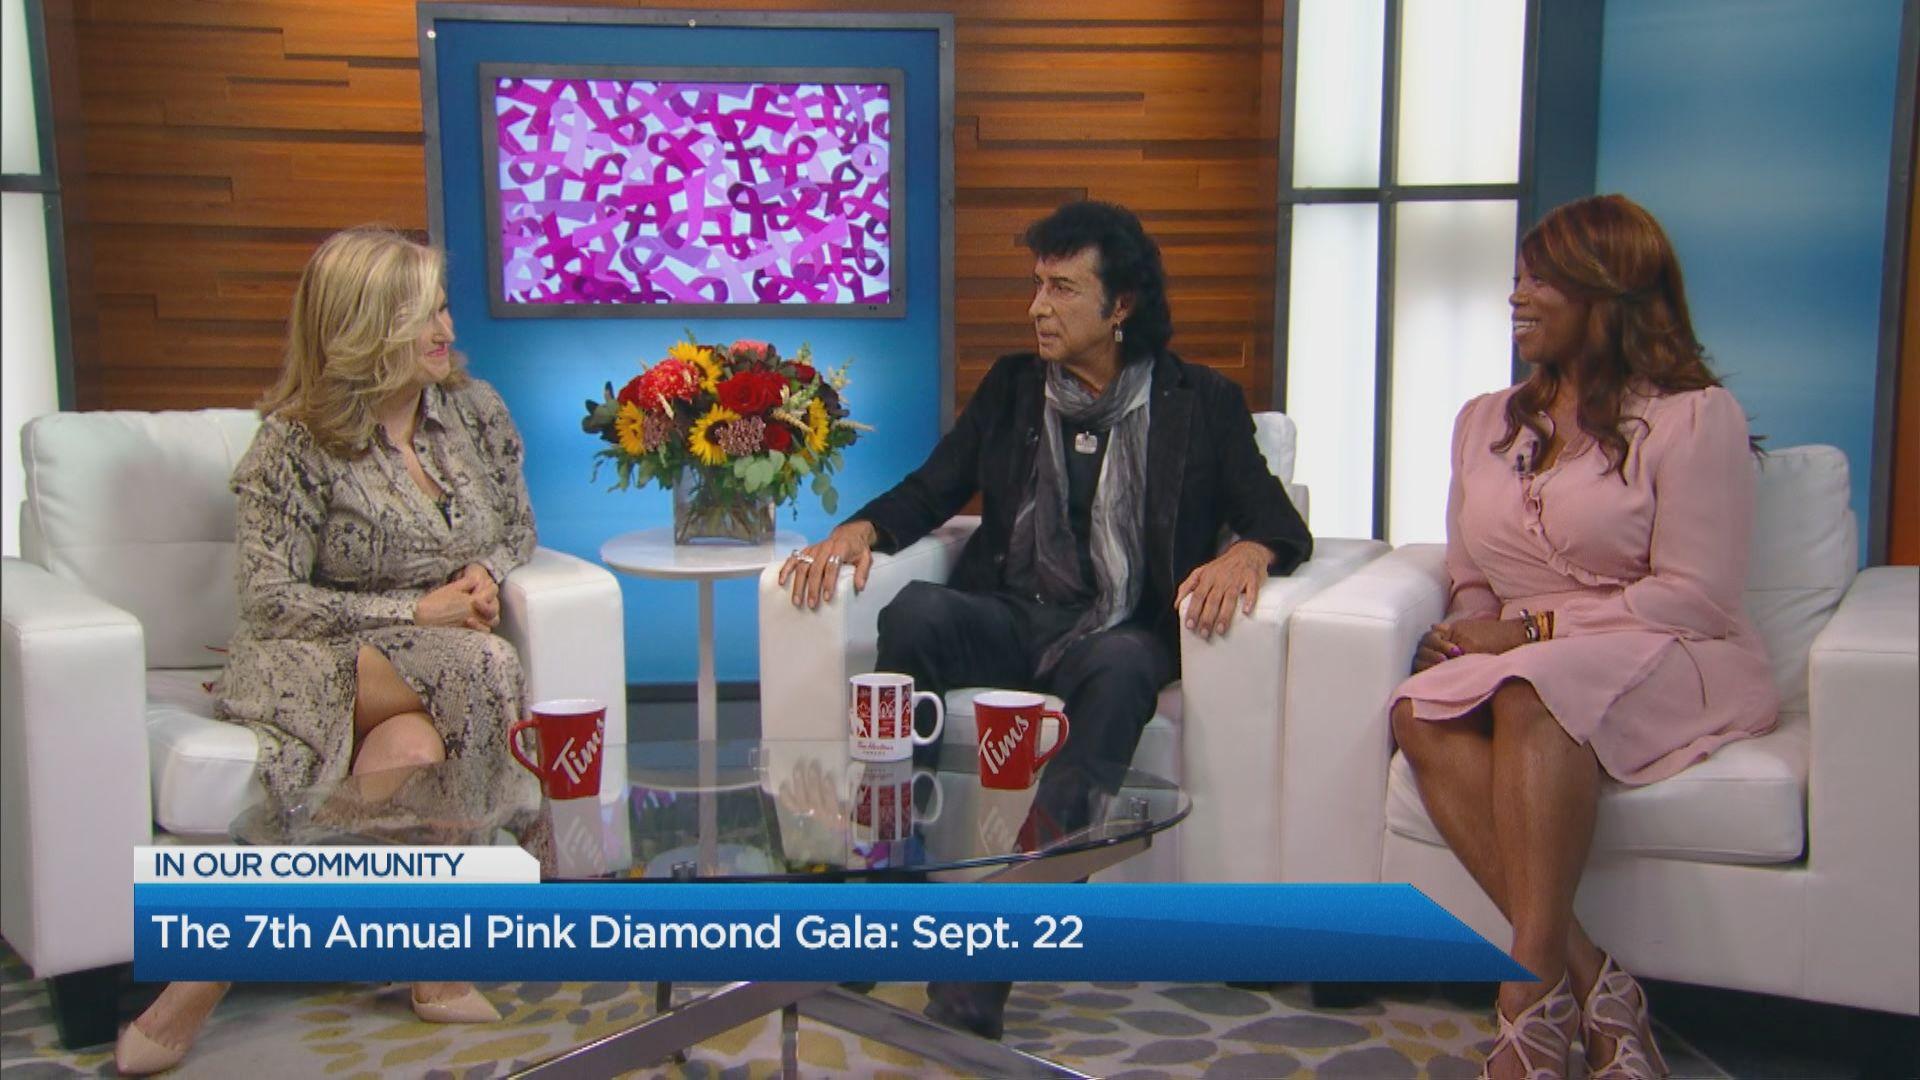 The 7th Annual Pink Diamond Gala